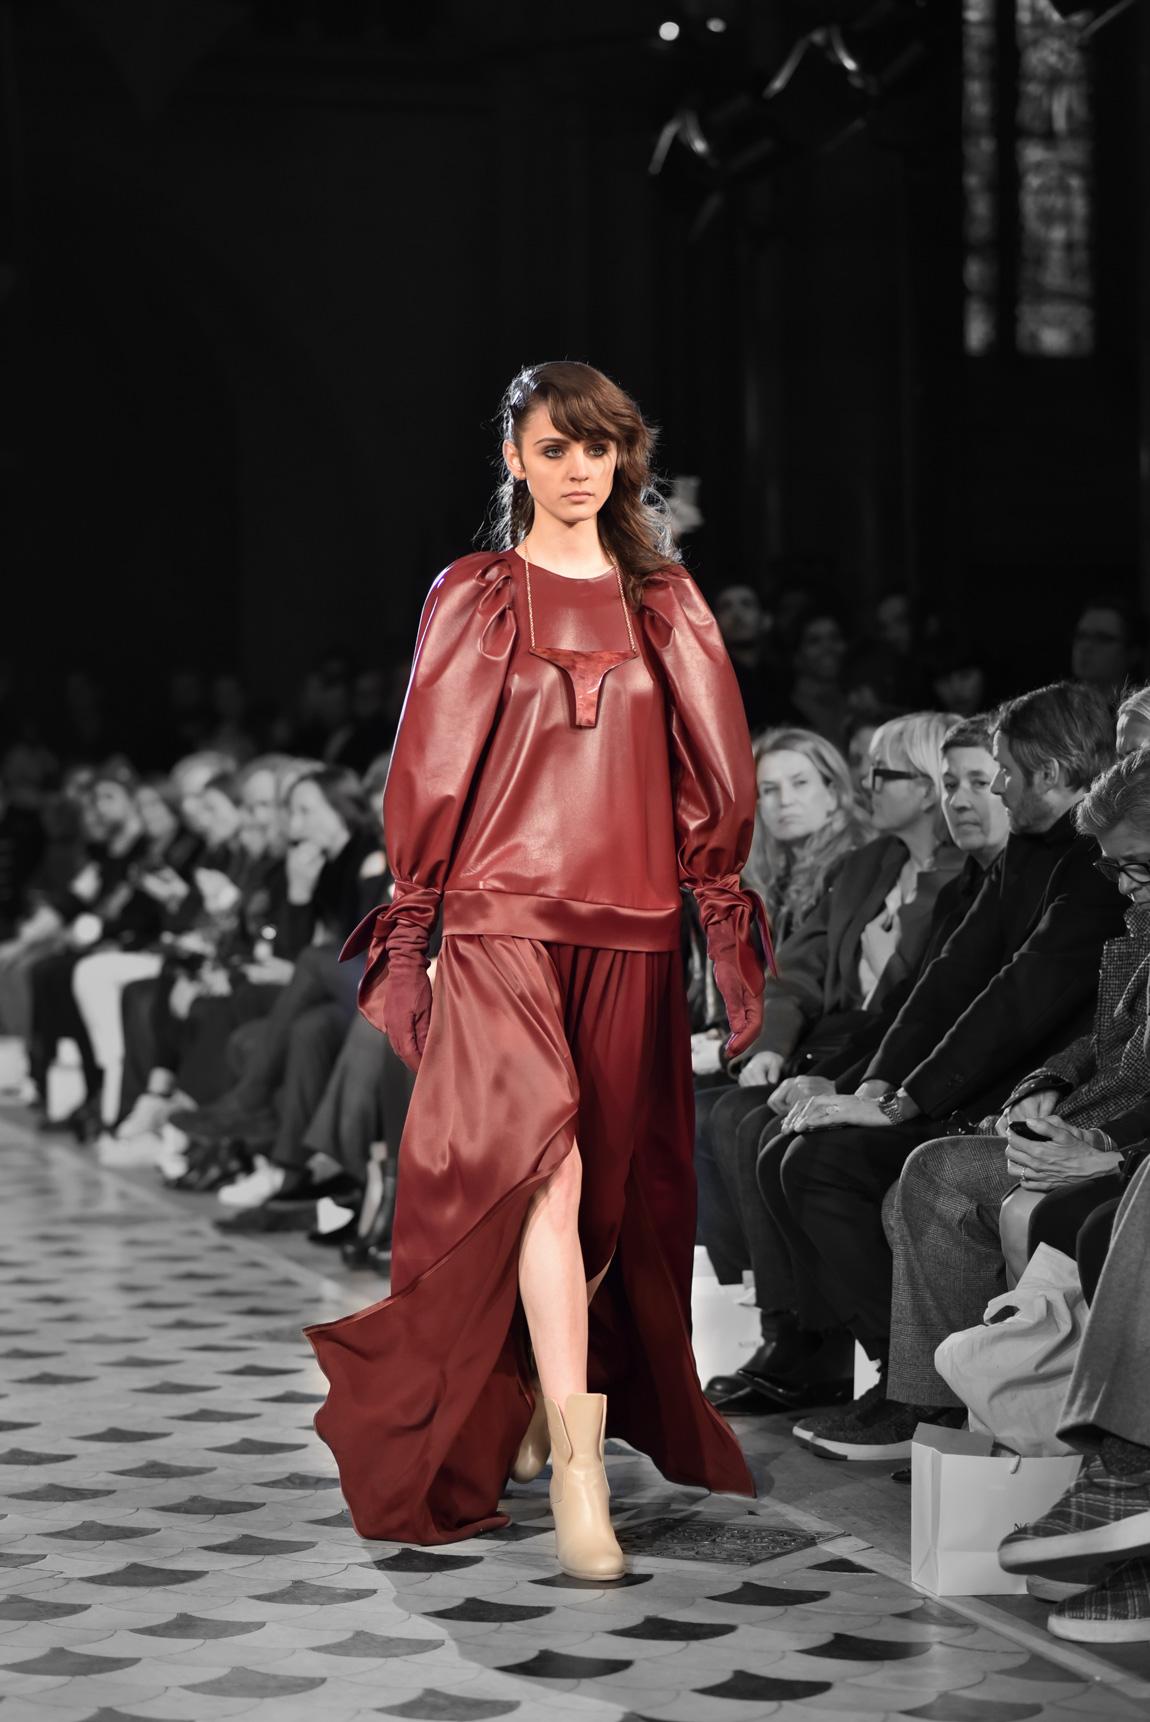 nobi talai, paris, fashionshow, modenschau, laufsteg, runway, kollektion, modedesign, fashion, designer, weinrot